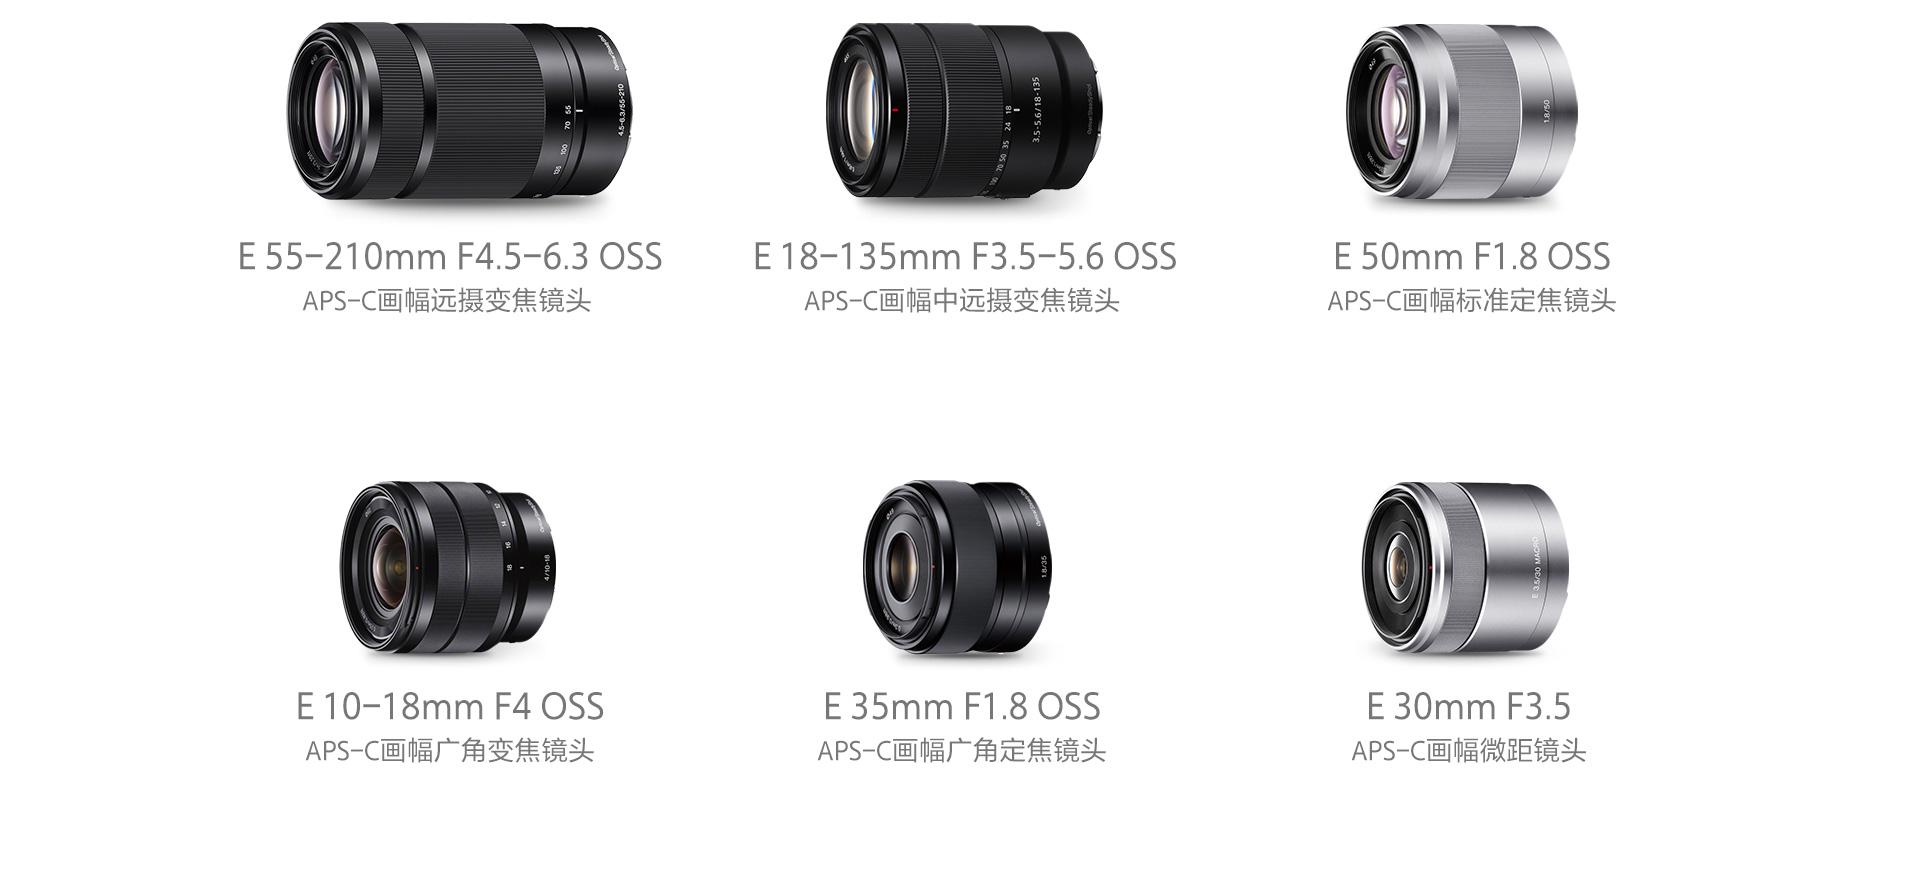 APS-C畫幅遠攝變焦鏡頭&APS-C畫幅中遠攝變焦鏡頭&APS-C畫幅標準定焦鏡頭&APS-C畫幅廣角變焦鏡頭&APS-C畫幅廣角定焦鏡頭&微距鏡頭